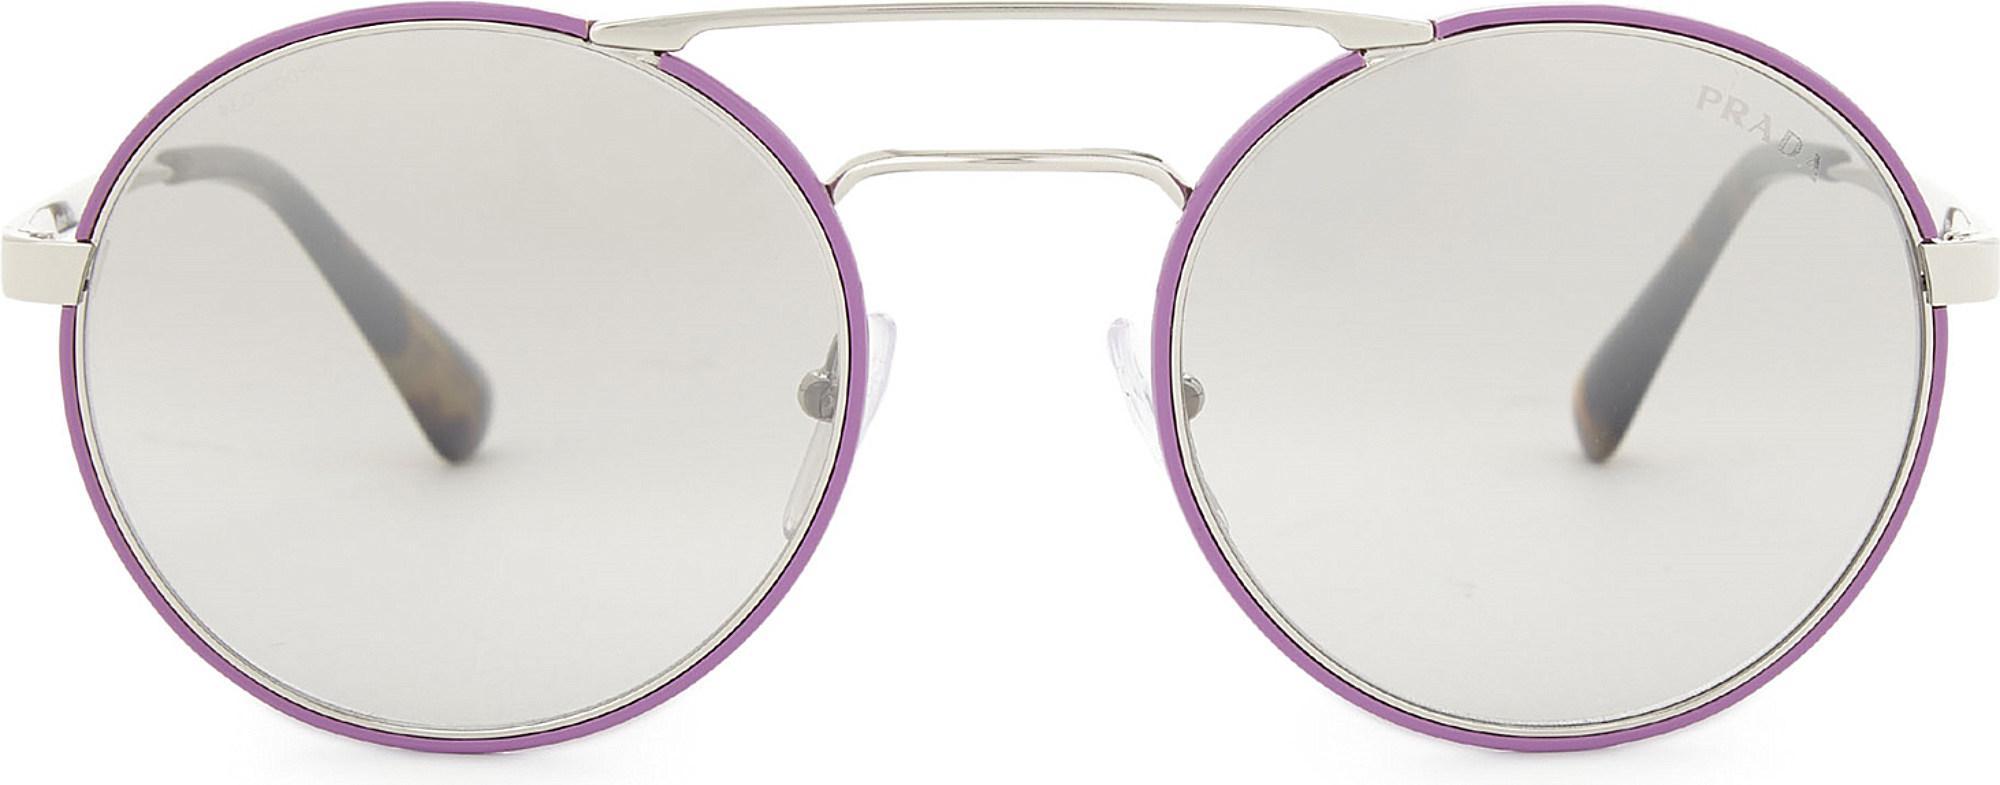 6c3b27c981 ... discount lyst prada pr51ss round frame sunglasses in metallic dd871  654d0